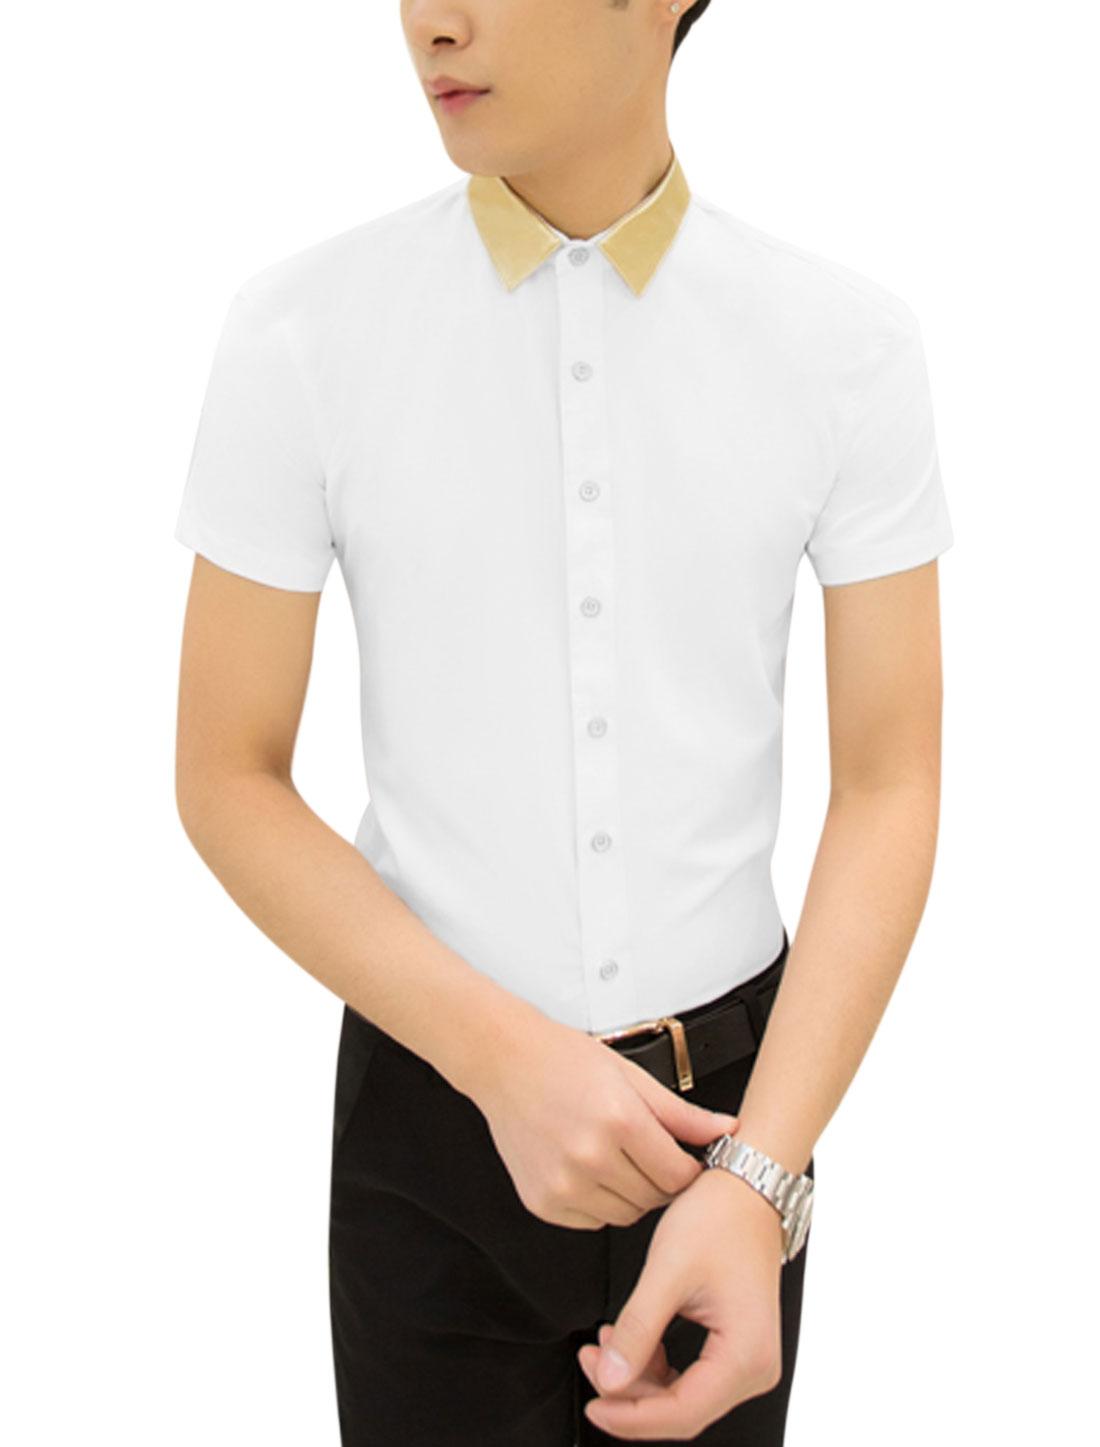 Men Point Collar Contrast Color Button Closed Leisure Shirt White M